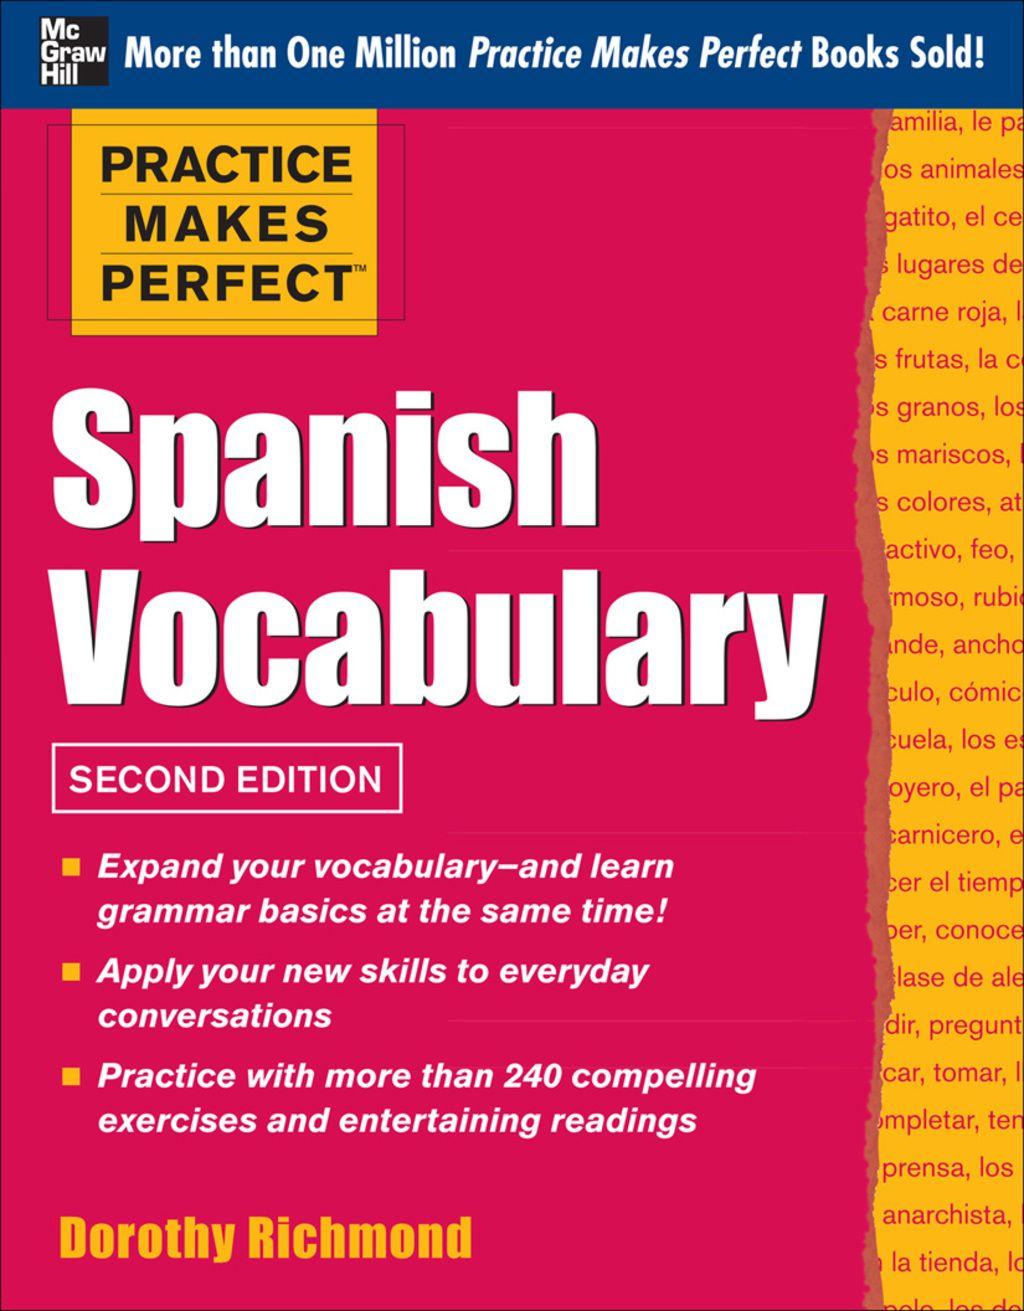 Practice Makes Perfect Spanish Vocabulary Ebook